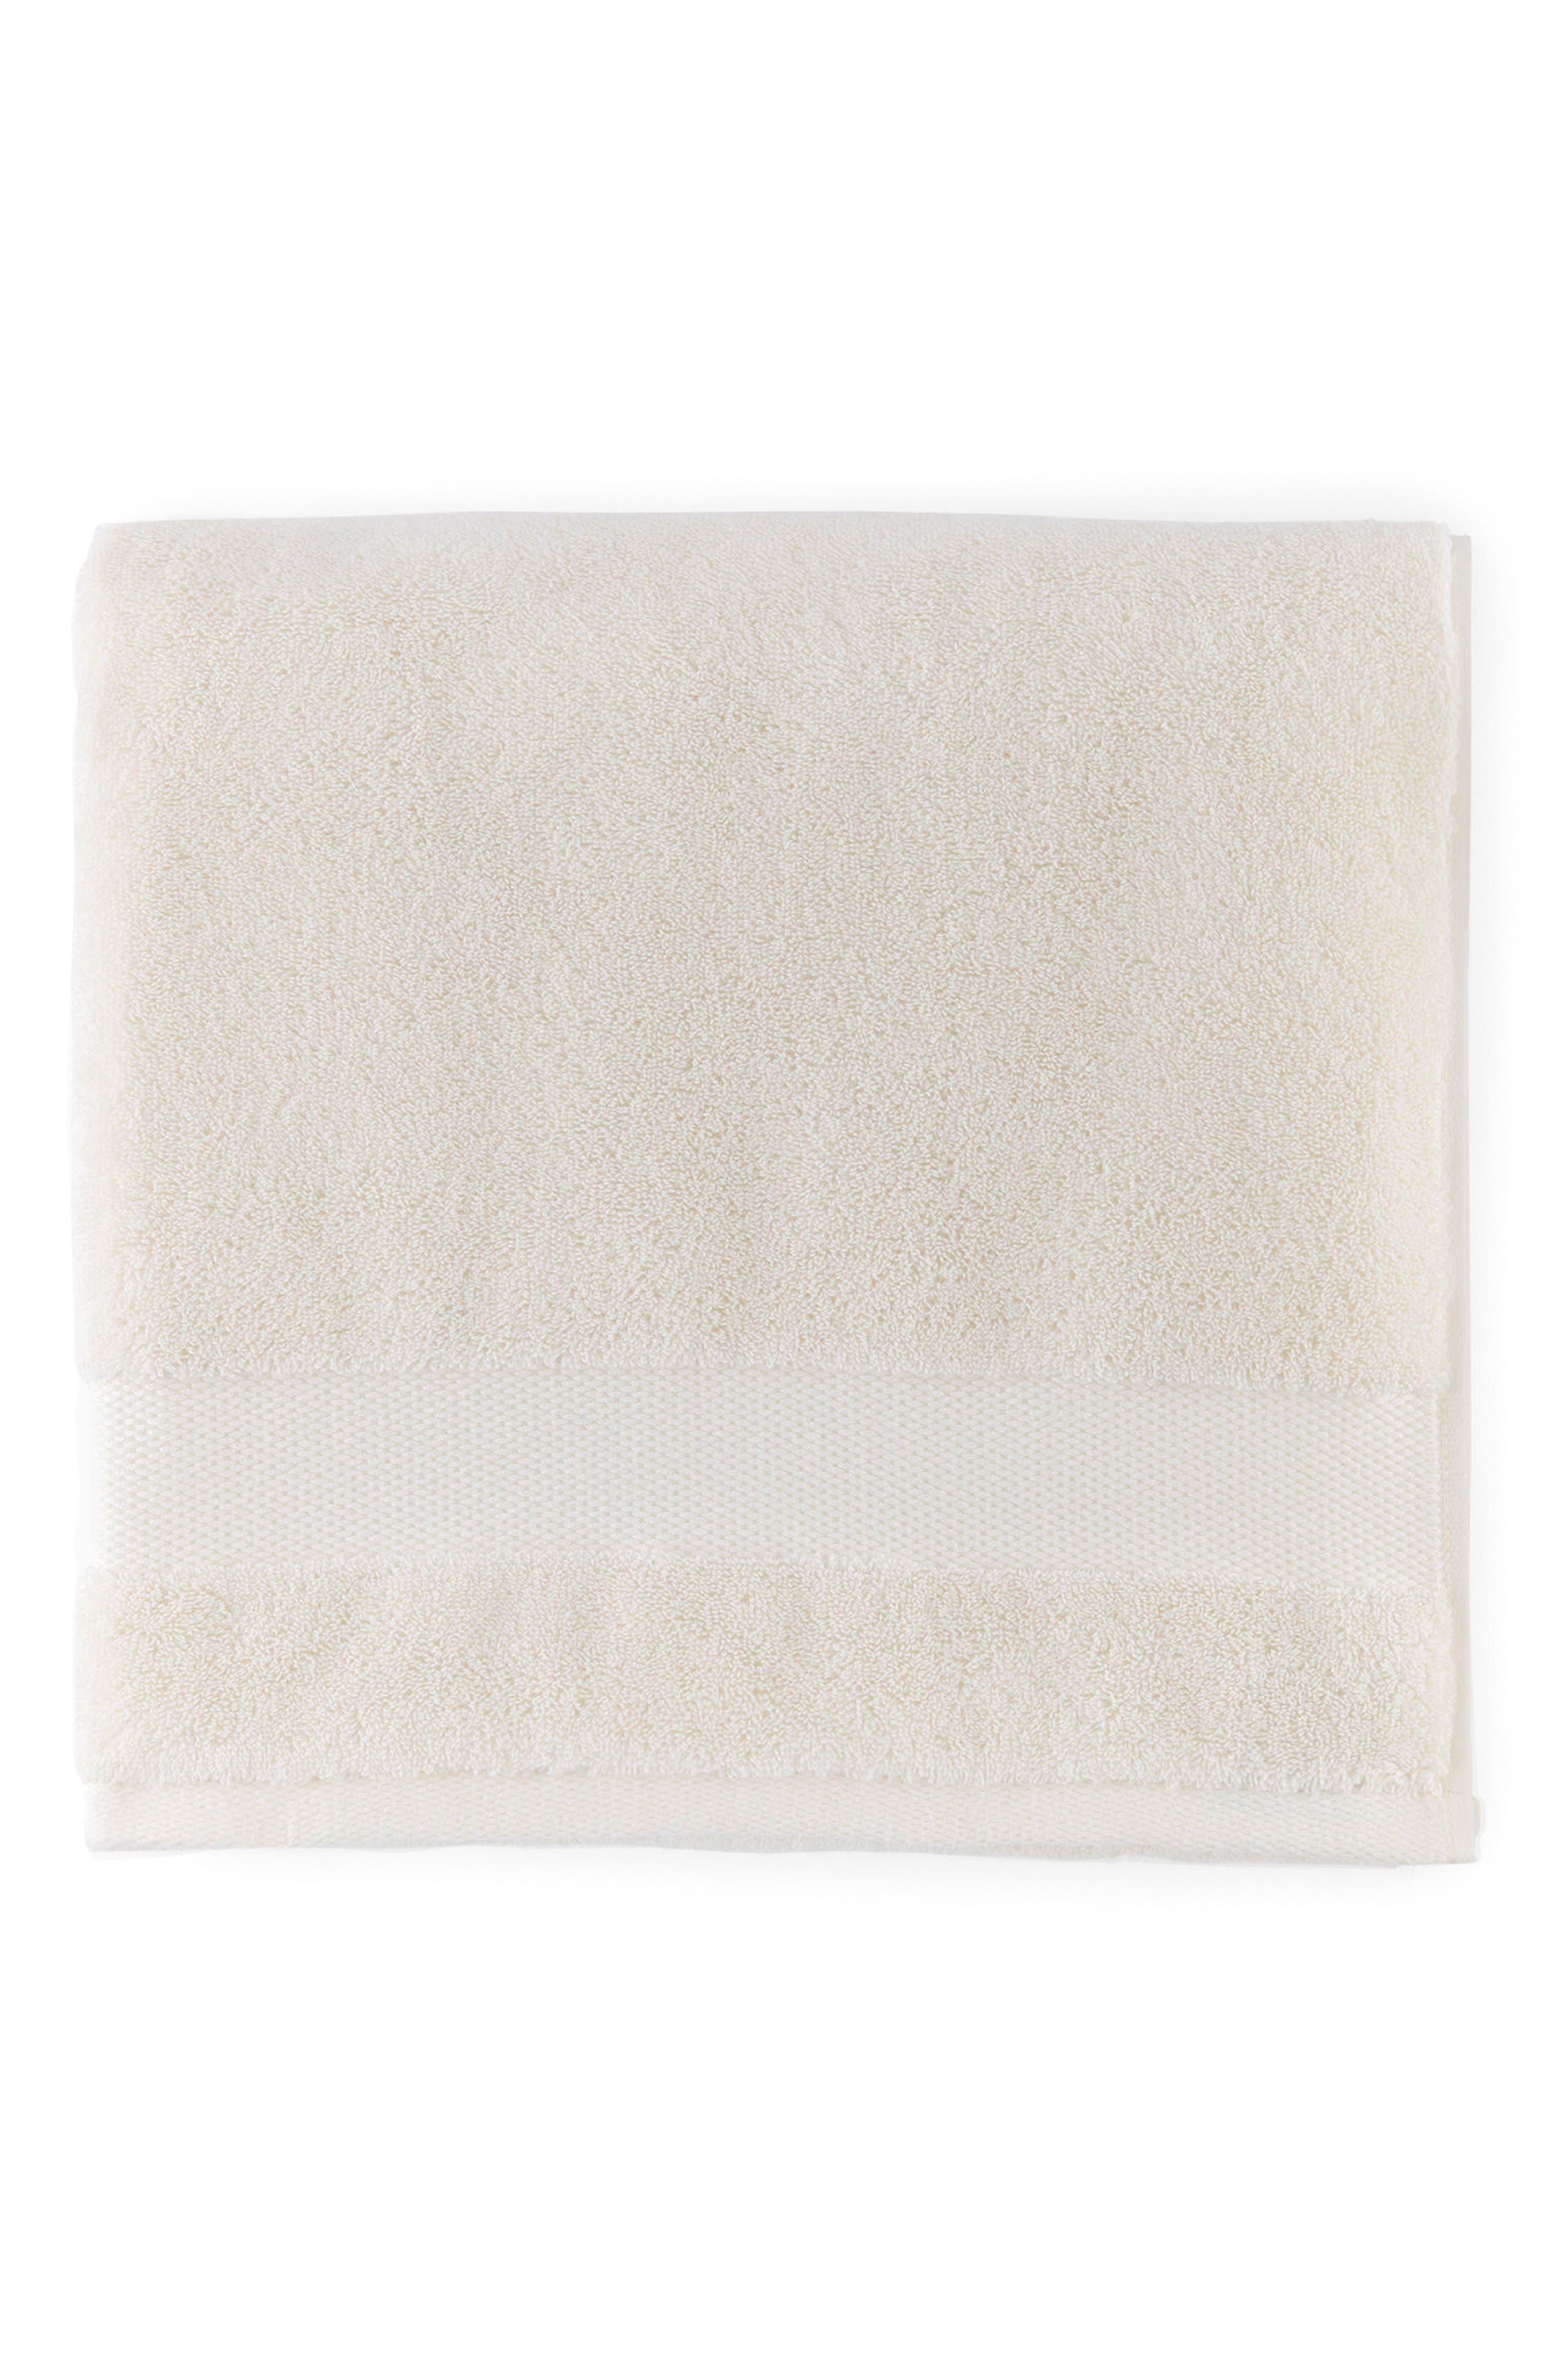 Main Image - SFERRA Bello Tip Towel